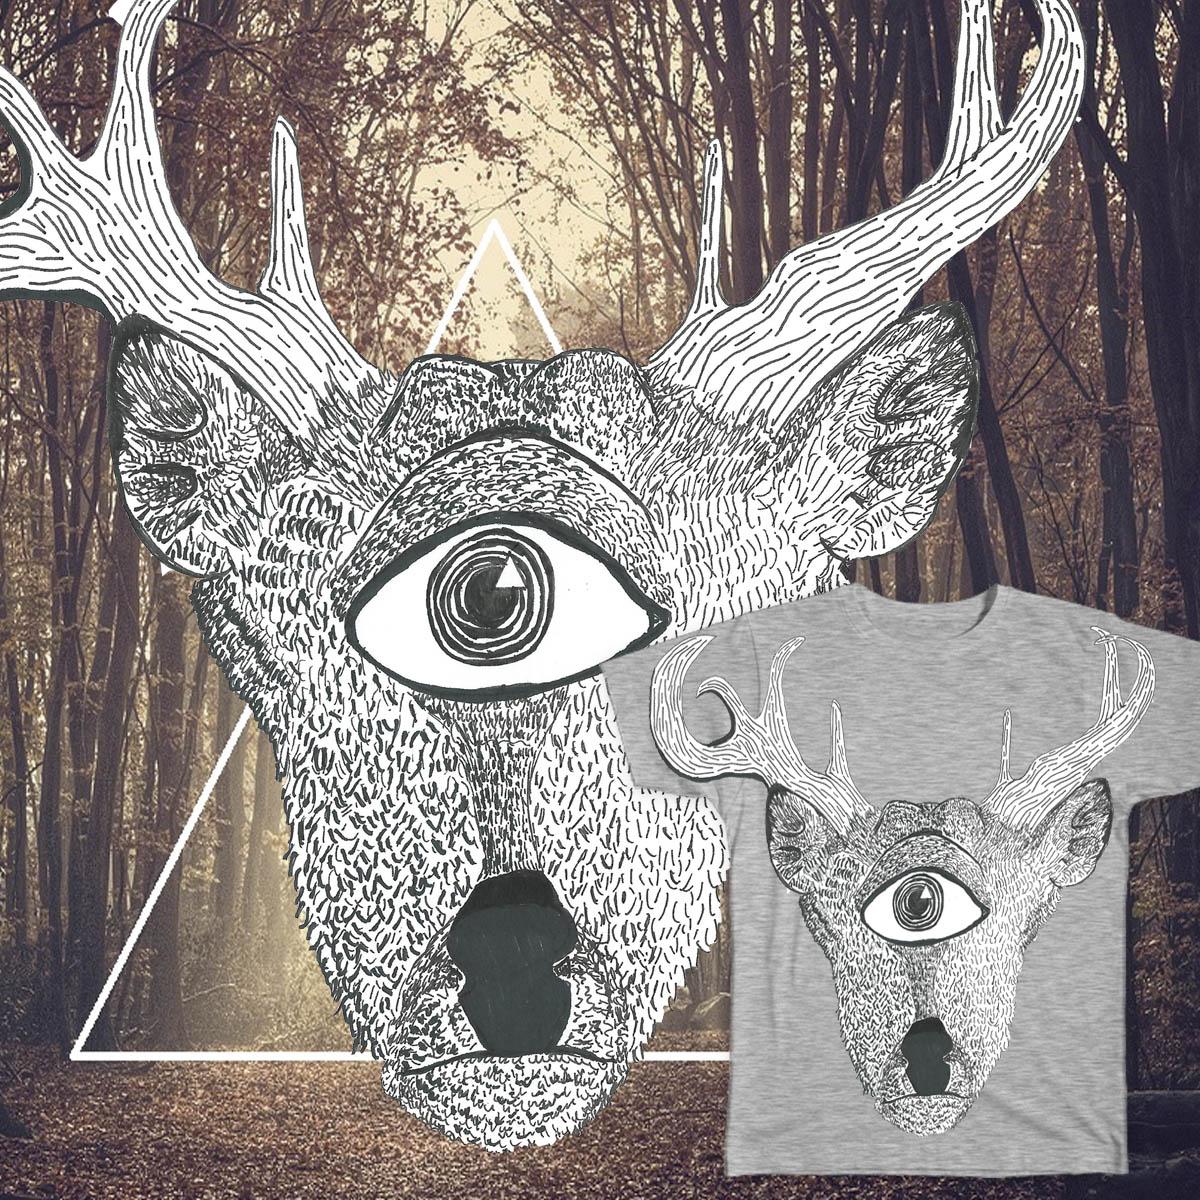 dEYEr by Dear Deer on Threadless